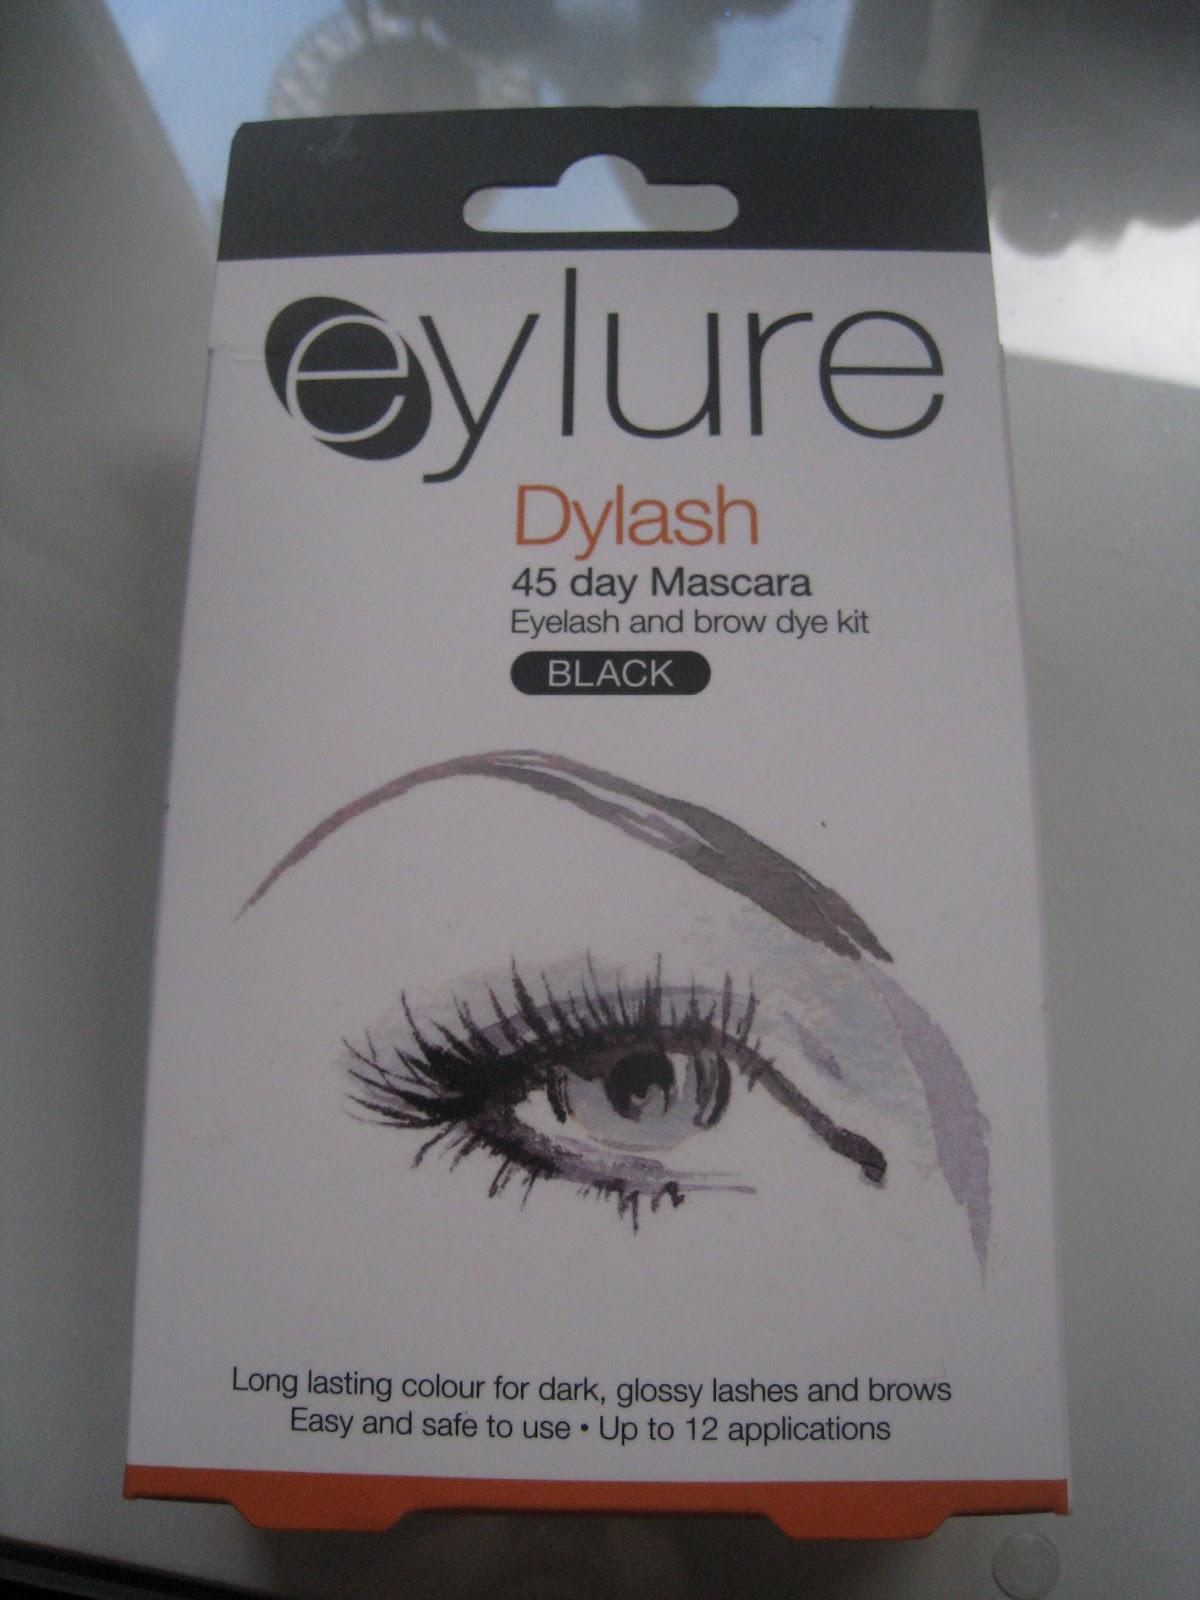 RivaSoave: Eyelure Dylash: Eyelash and brow dye kit Review